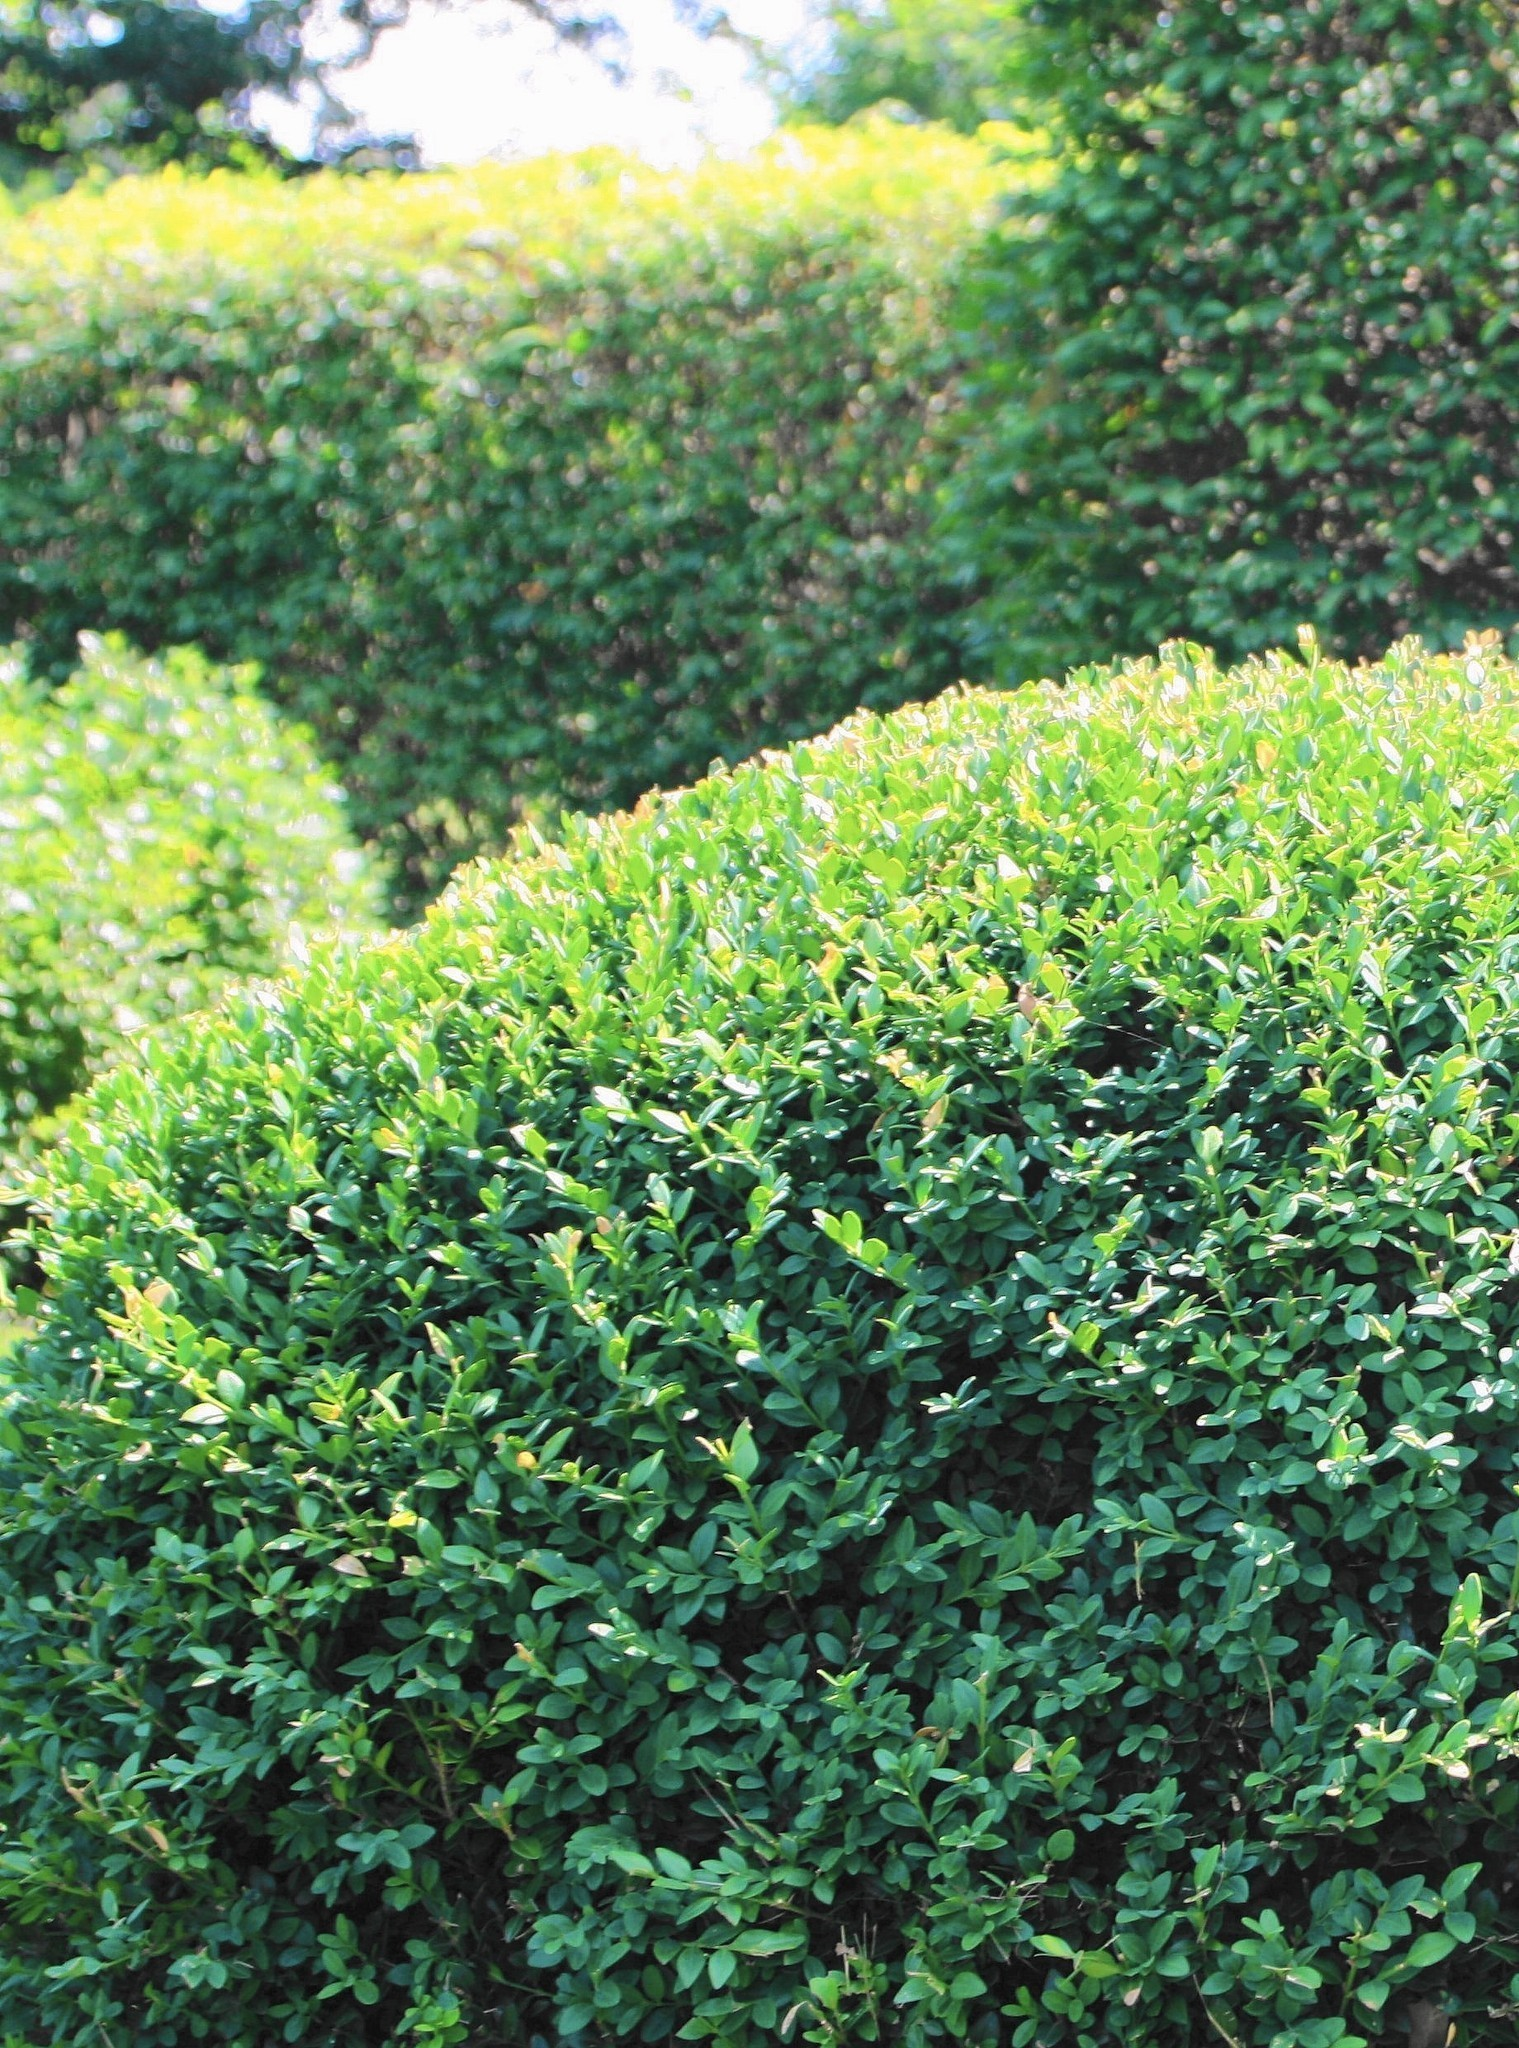 How To Help Damaged Evergreen Shrubs Rebound From Winter